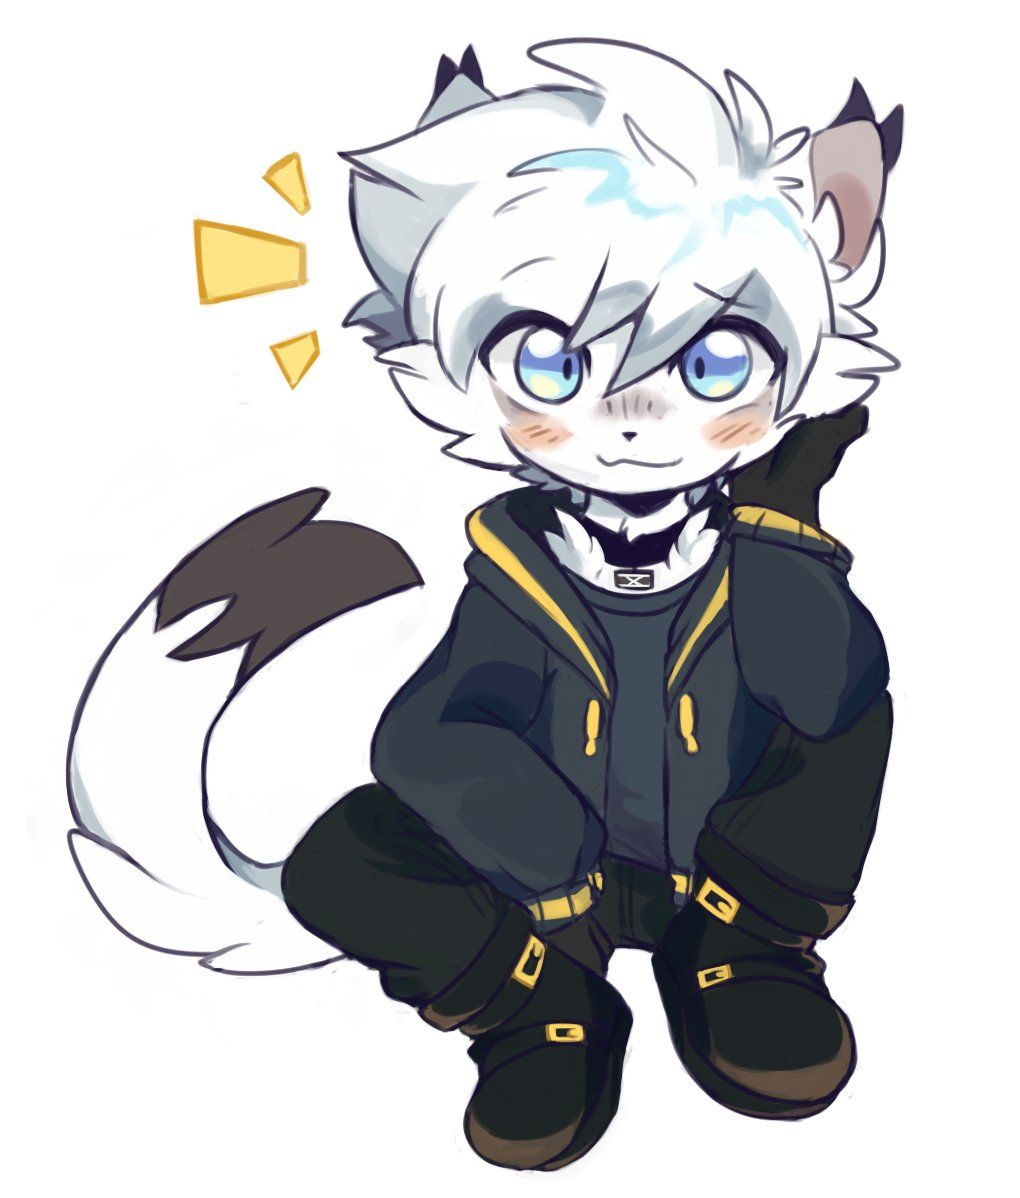 Twitter Furry Oc Furry Drawing Furry Art